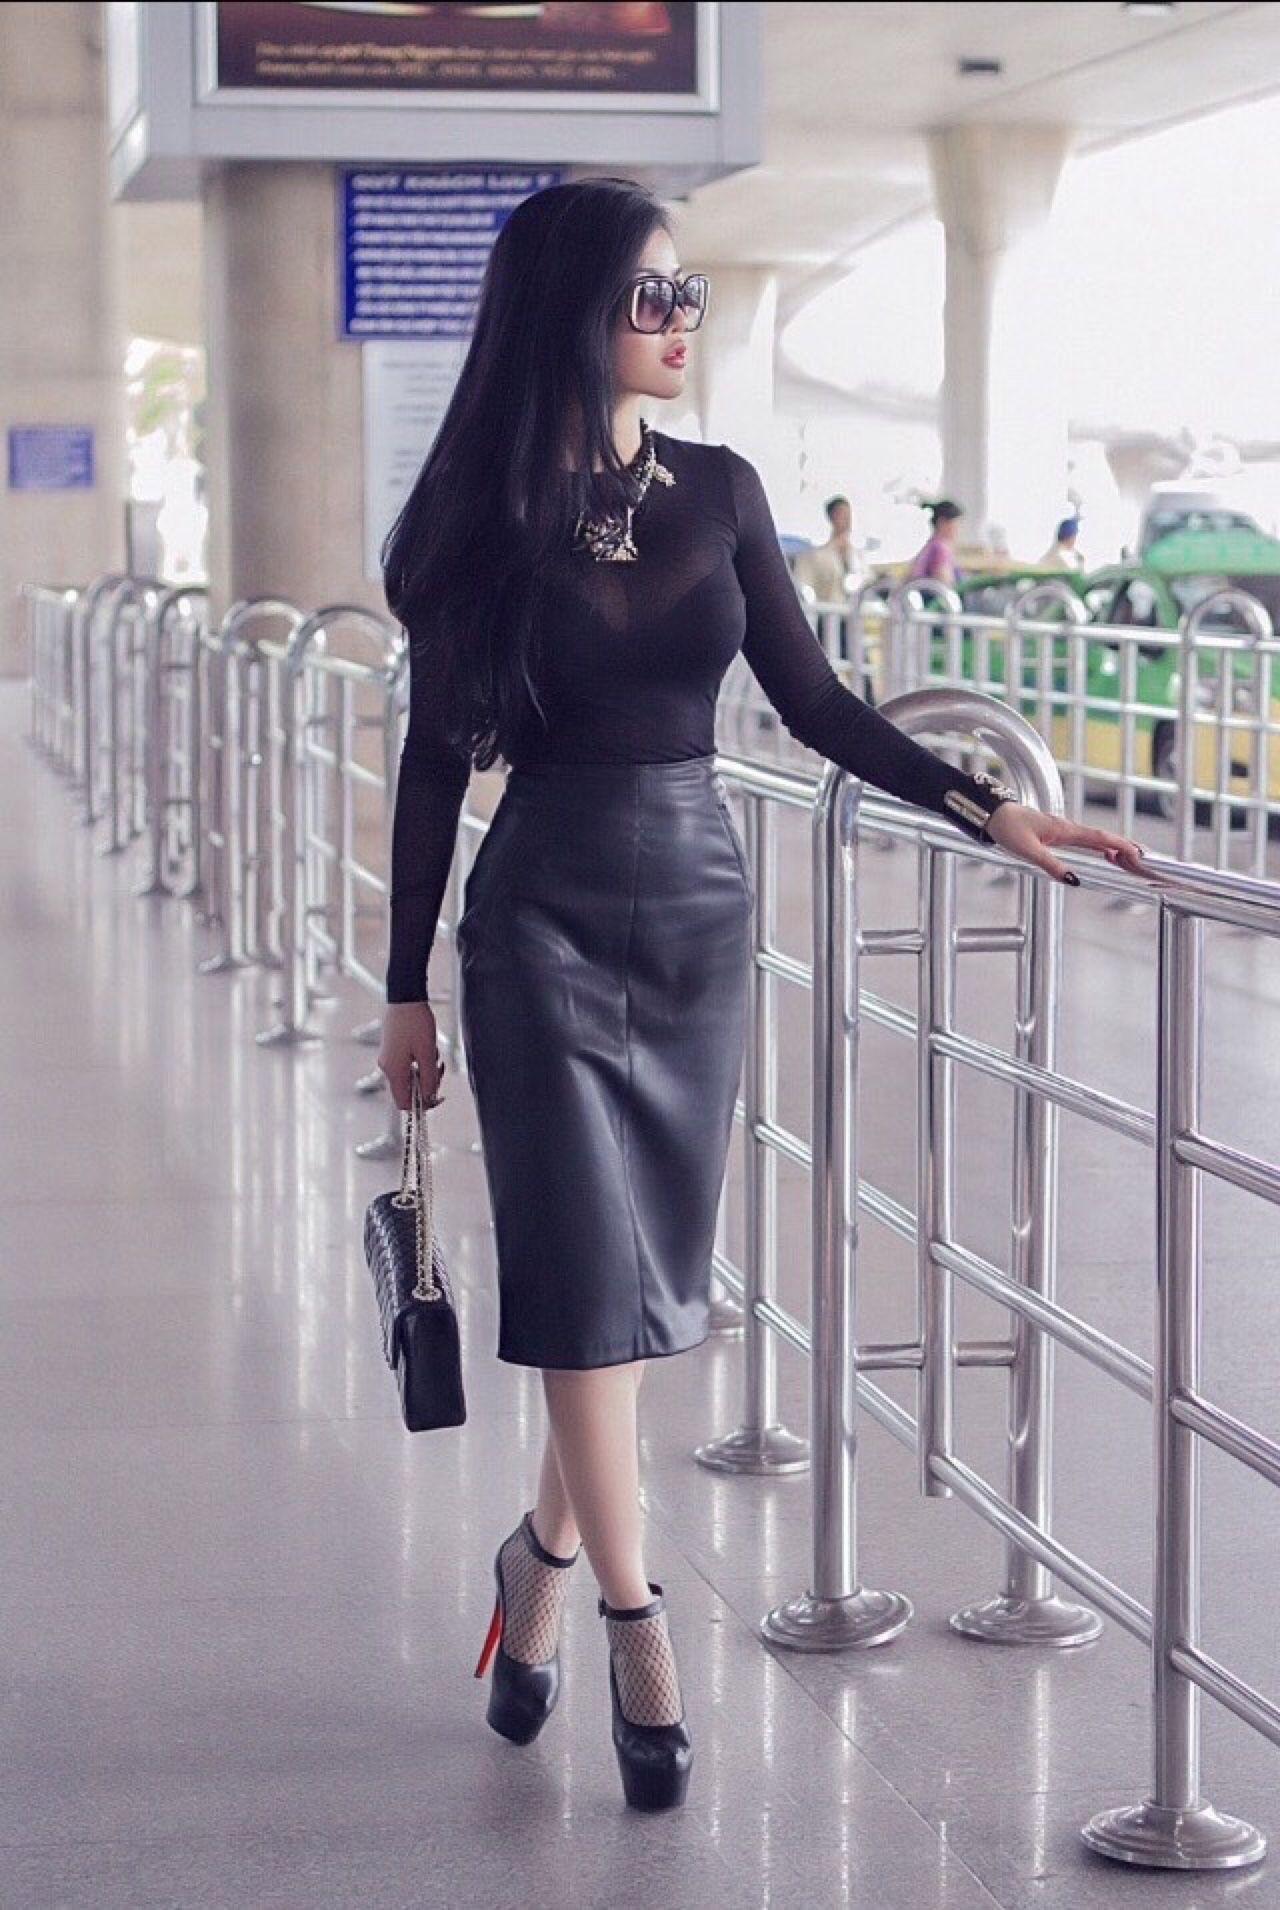 8fb7492c643f5 Pin on Leather fashions. | Fashion, Leather fashion, Leather skirt